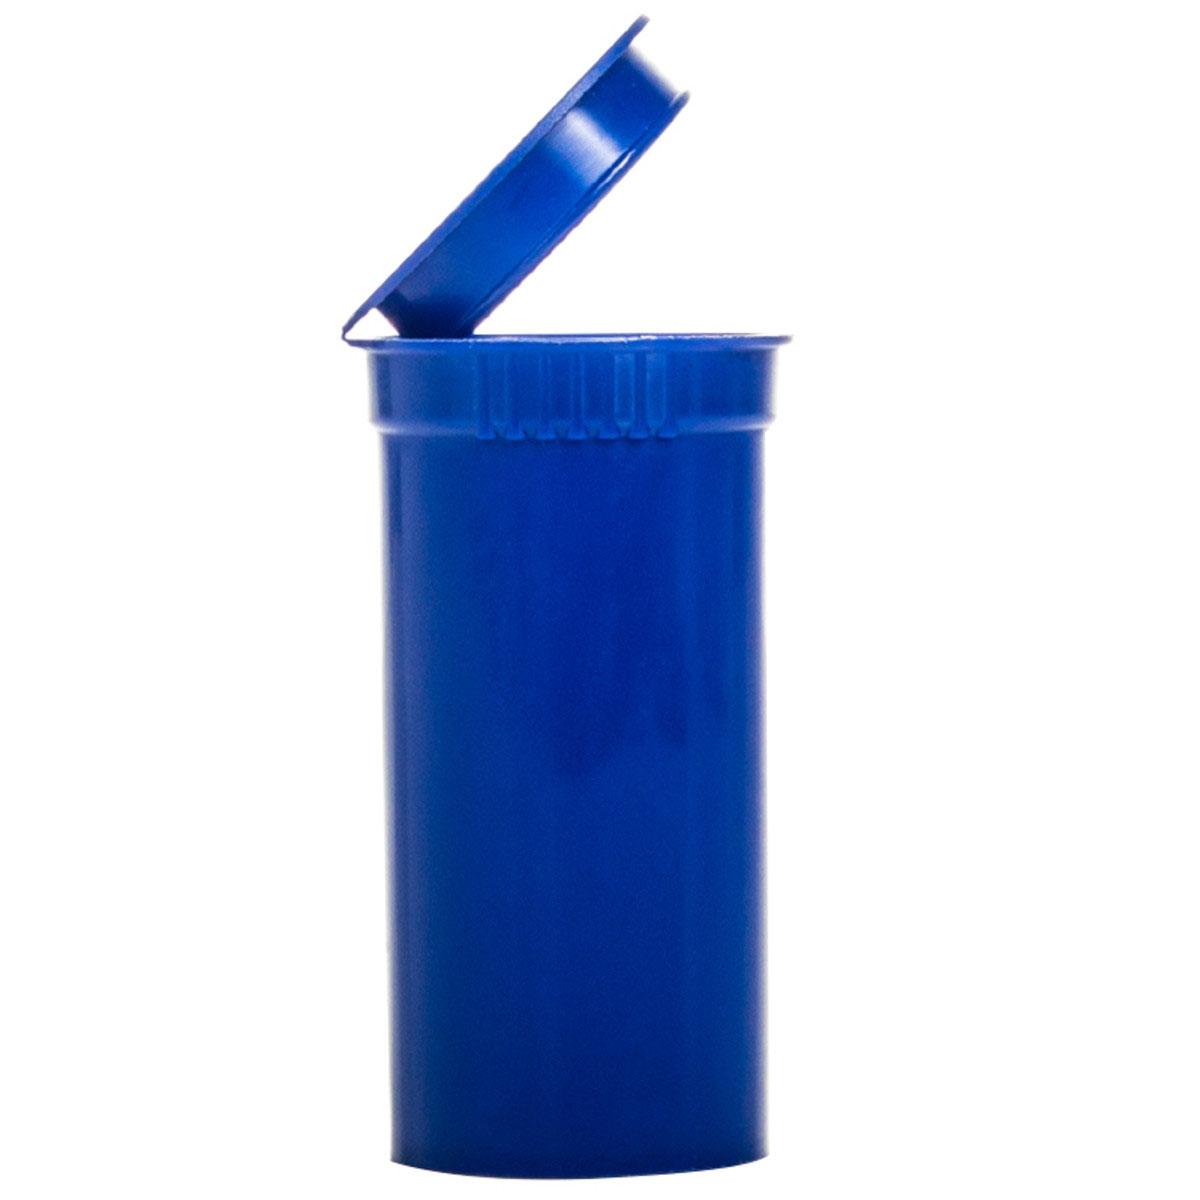 13 Dram Opaque Blueberry Child Resistant Pop Top Bottles Big Box (630 Qty.)